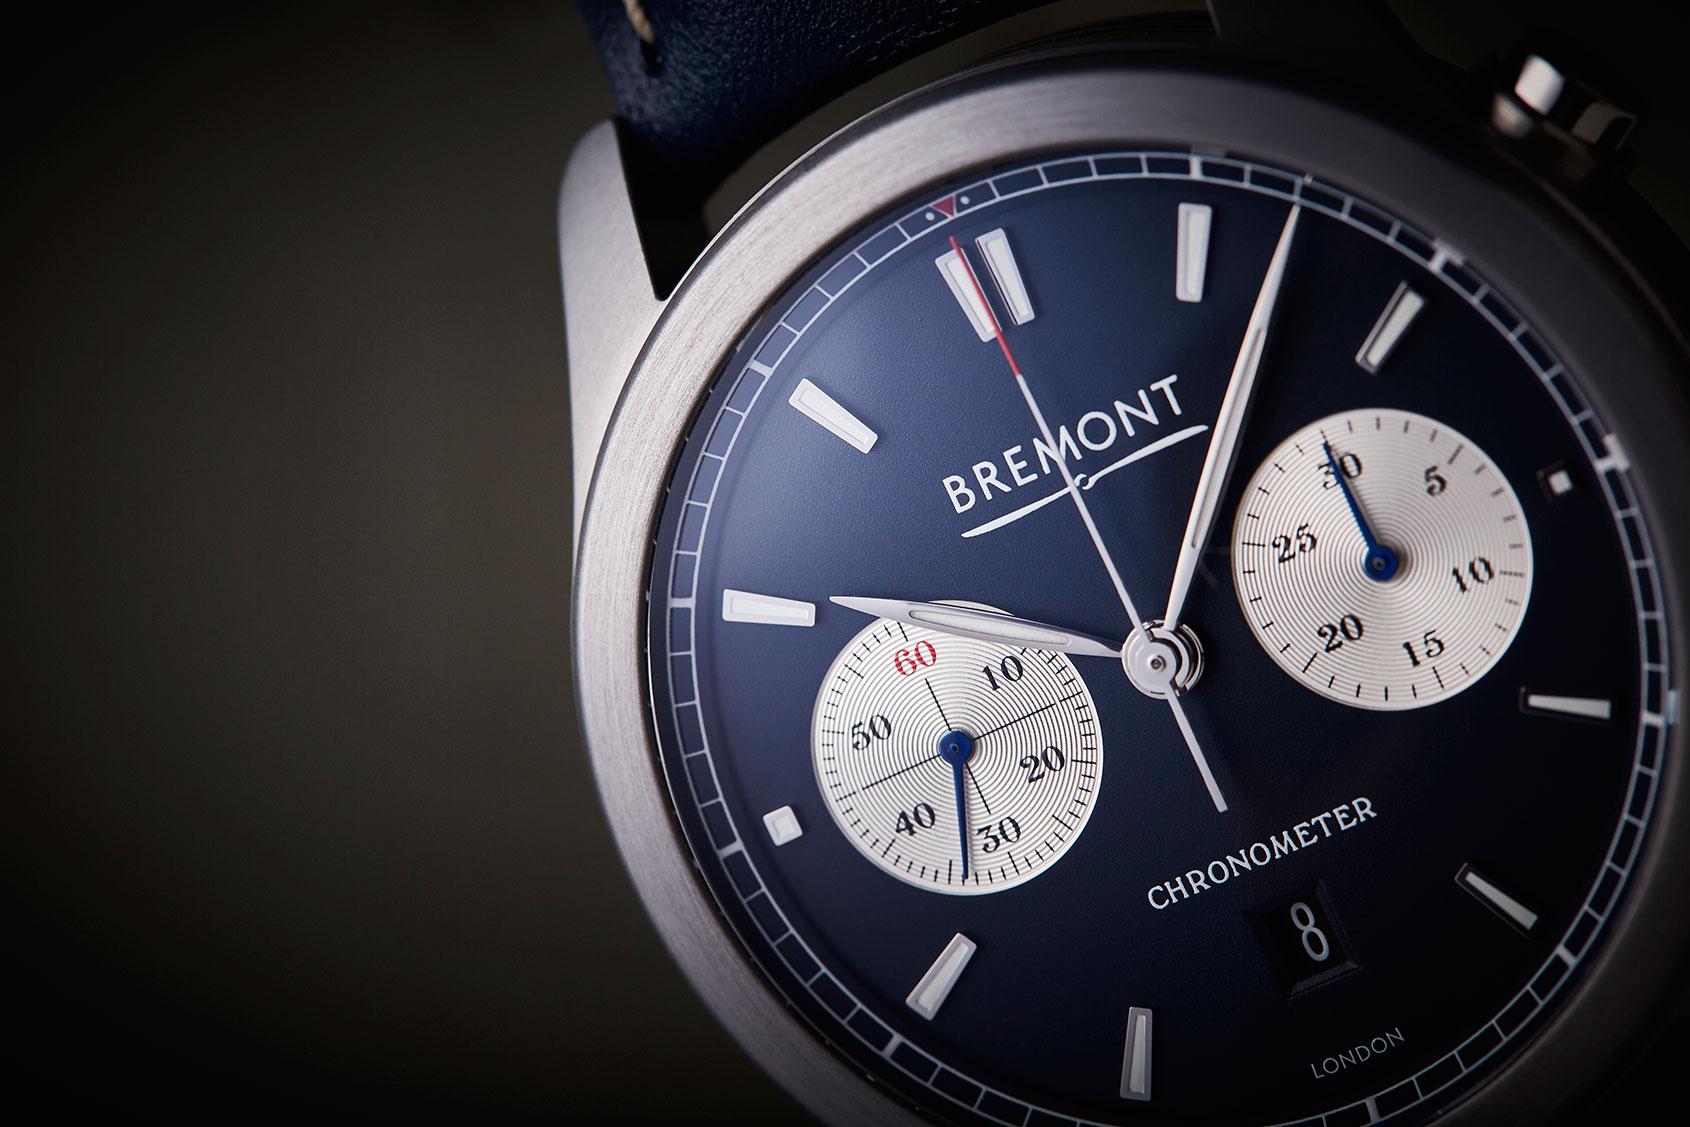 INTRODUCING: The Bremont ALT1-C gets 2 new dials